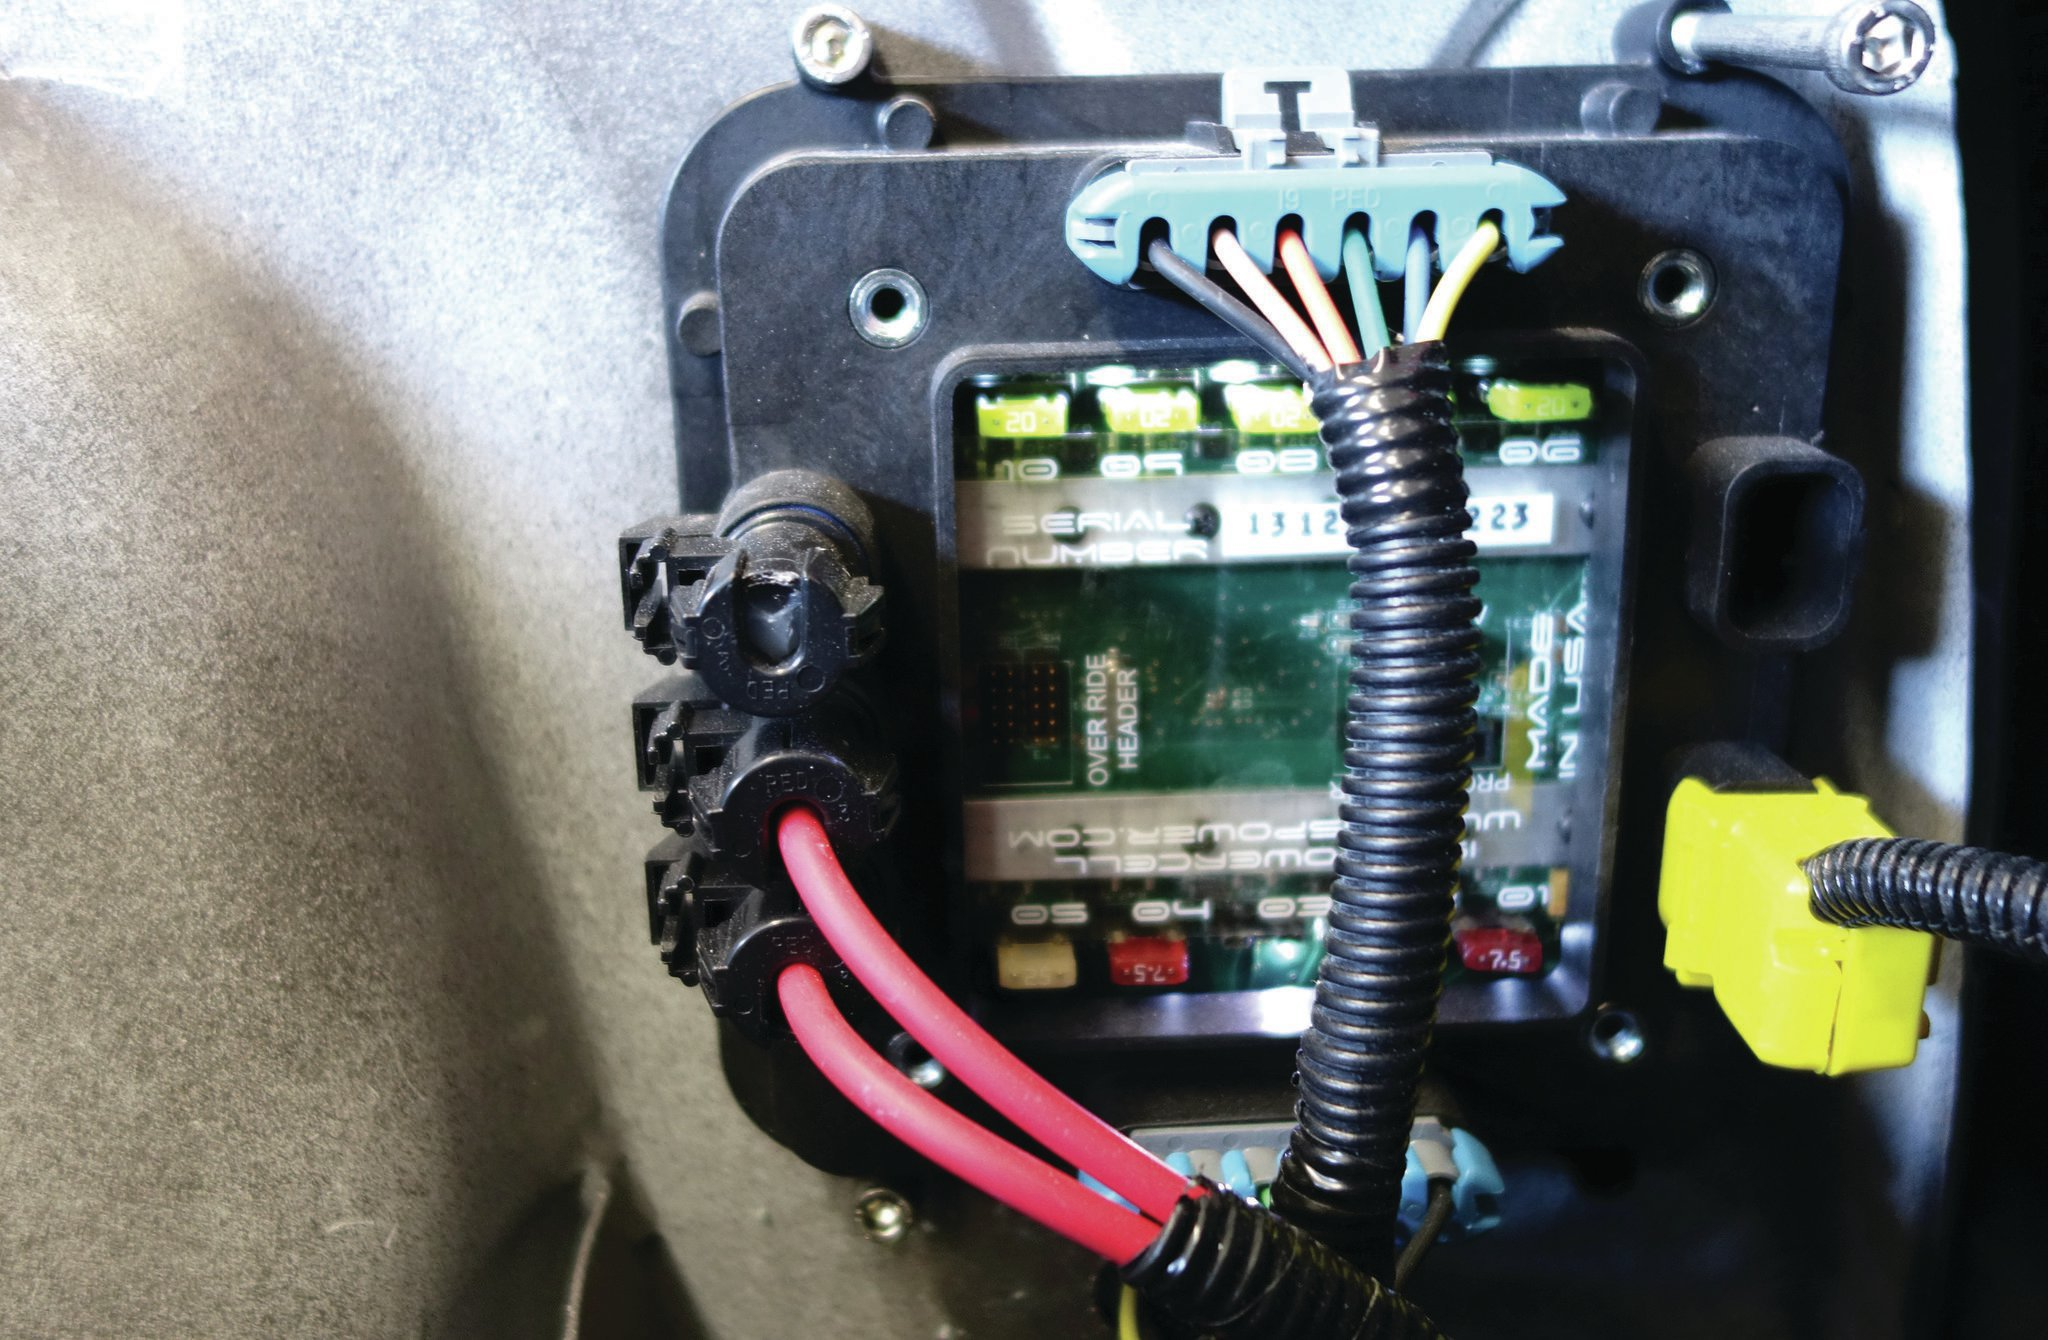 isis wiring harness data wiring diagram u2022 rh chamaela co Automotive Wiring Harness Engine Wiring Harness